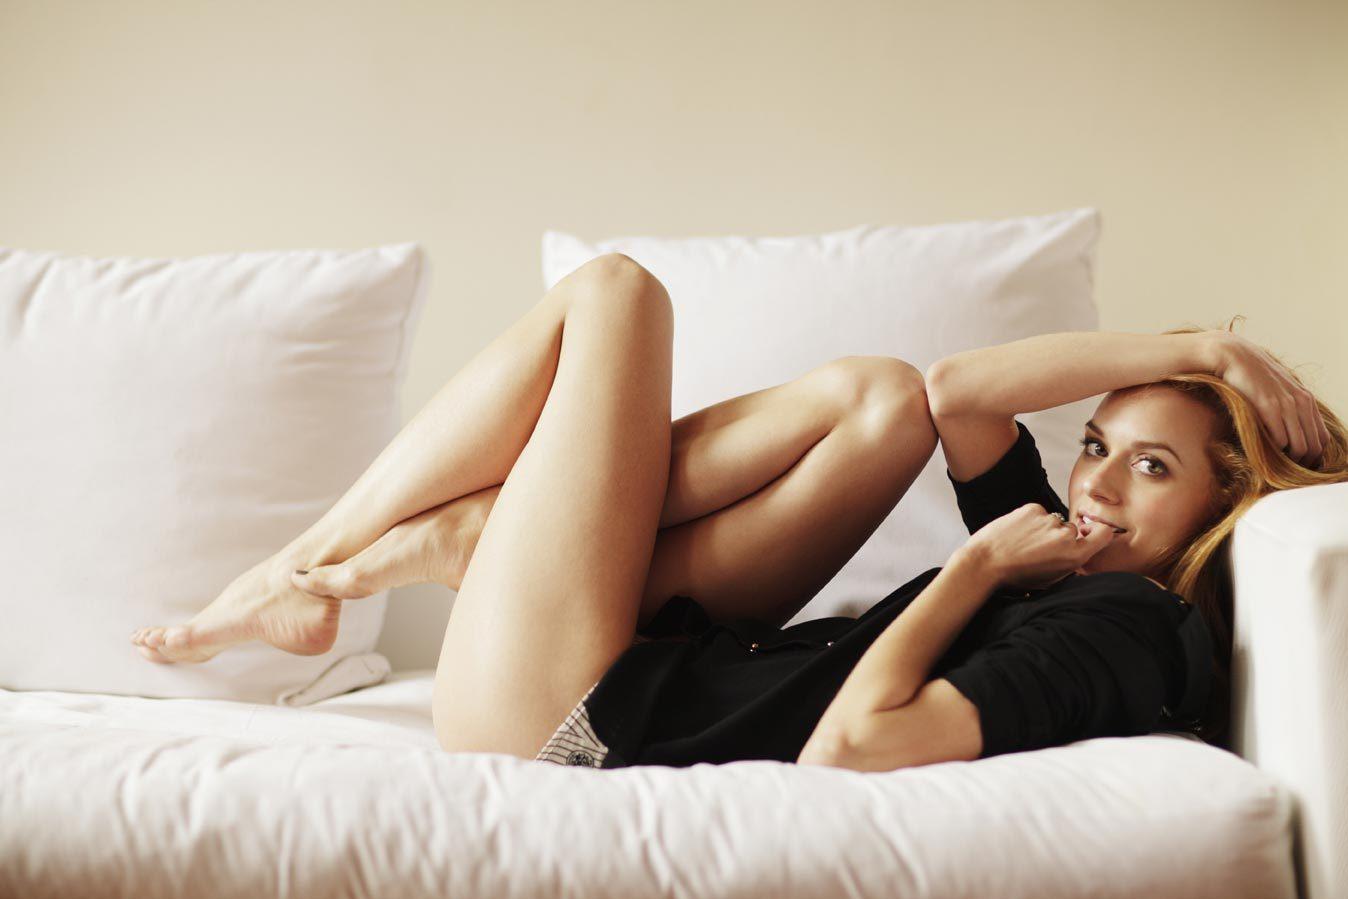 Hilarie burton sexy